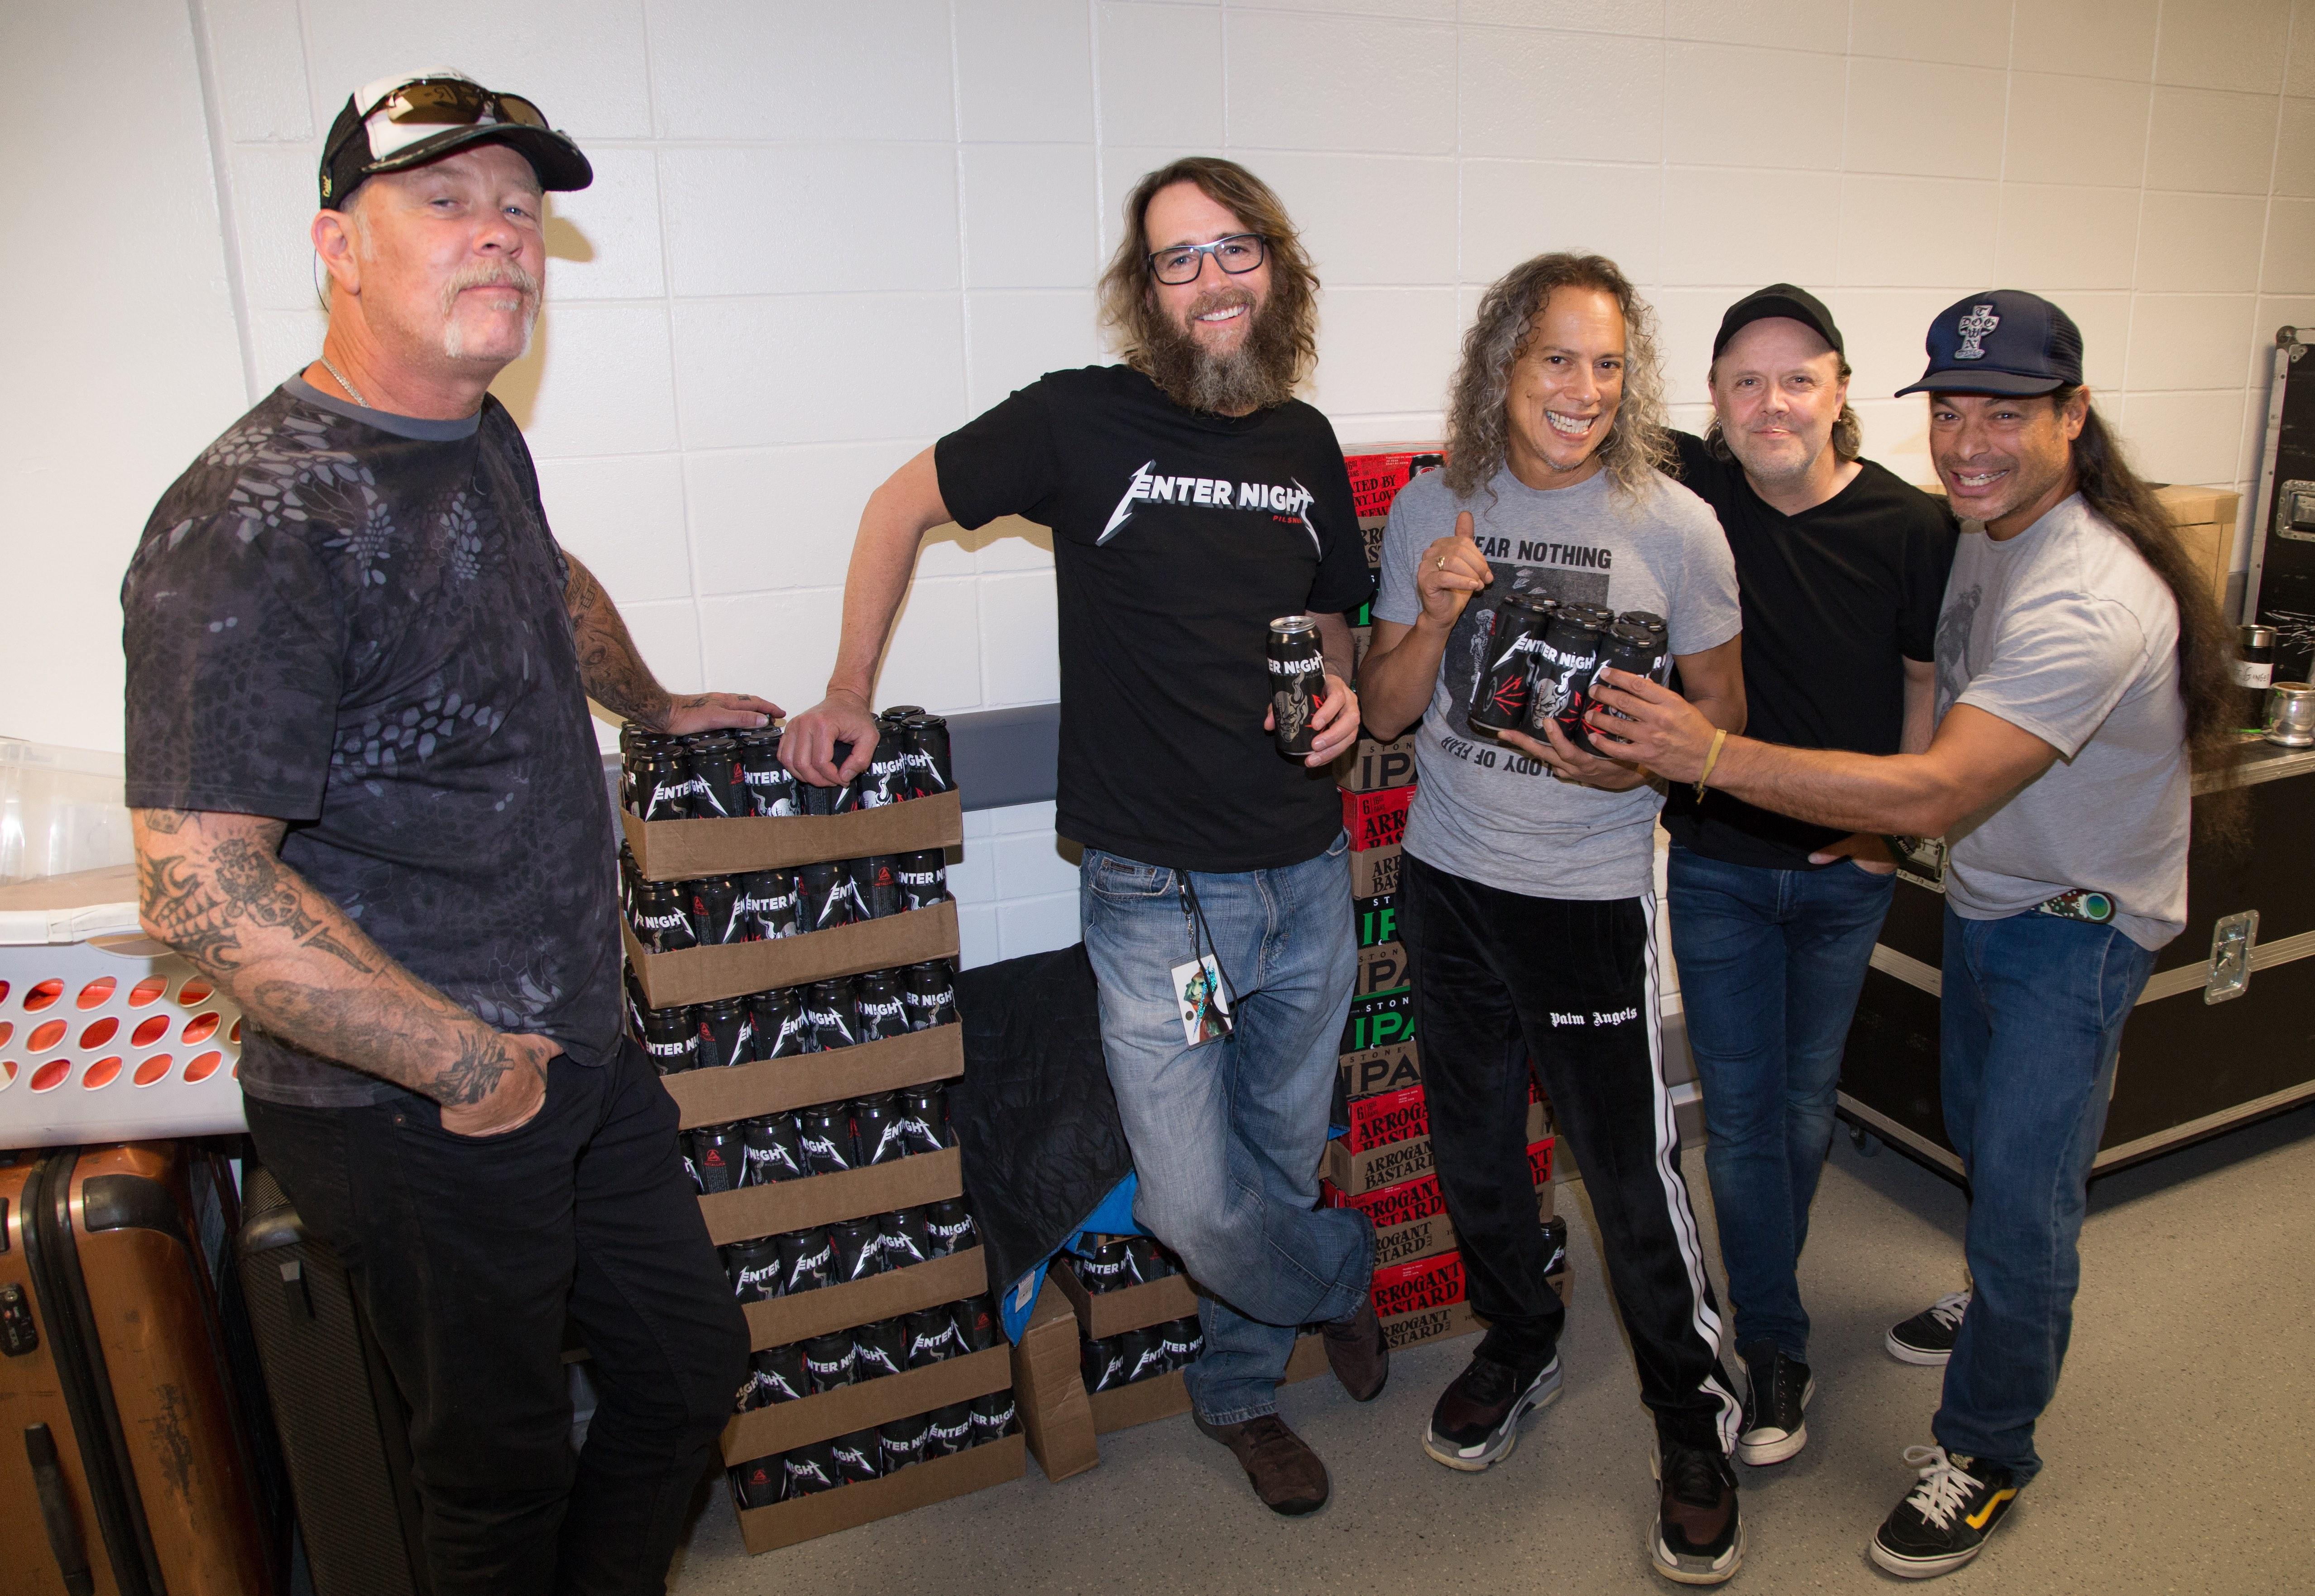 James Hetfield, Metallica lead vocalist; Greg Koch, Stone Brewing co-founder; Kirk Hammett, Metallica lead guitarist; Lars Ulrich, Metallica drummer; Robert Trujillo, Metallica basist. (image courtesy of Stone Brewing)